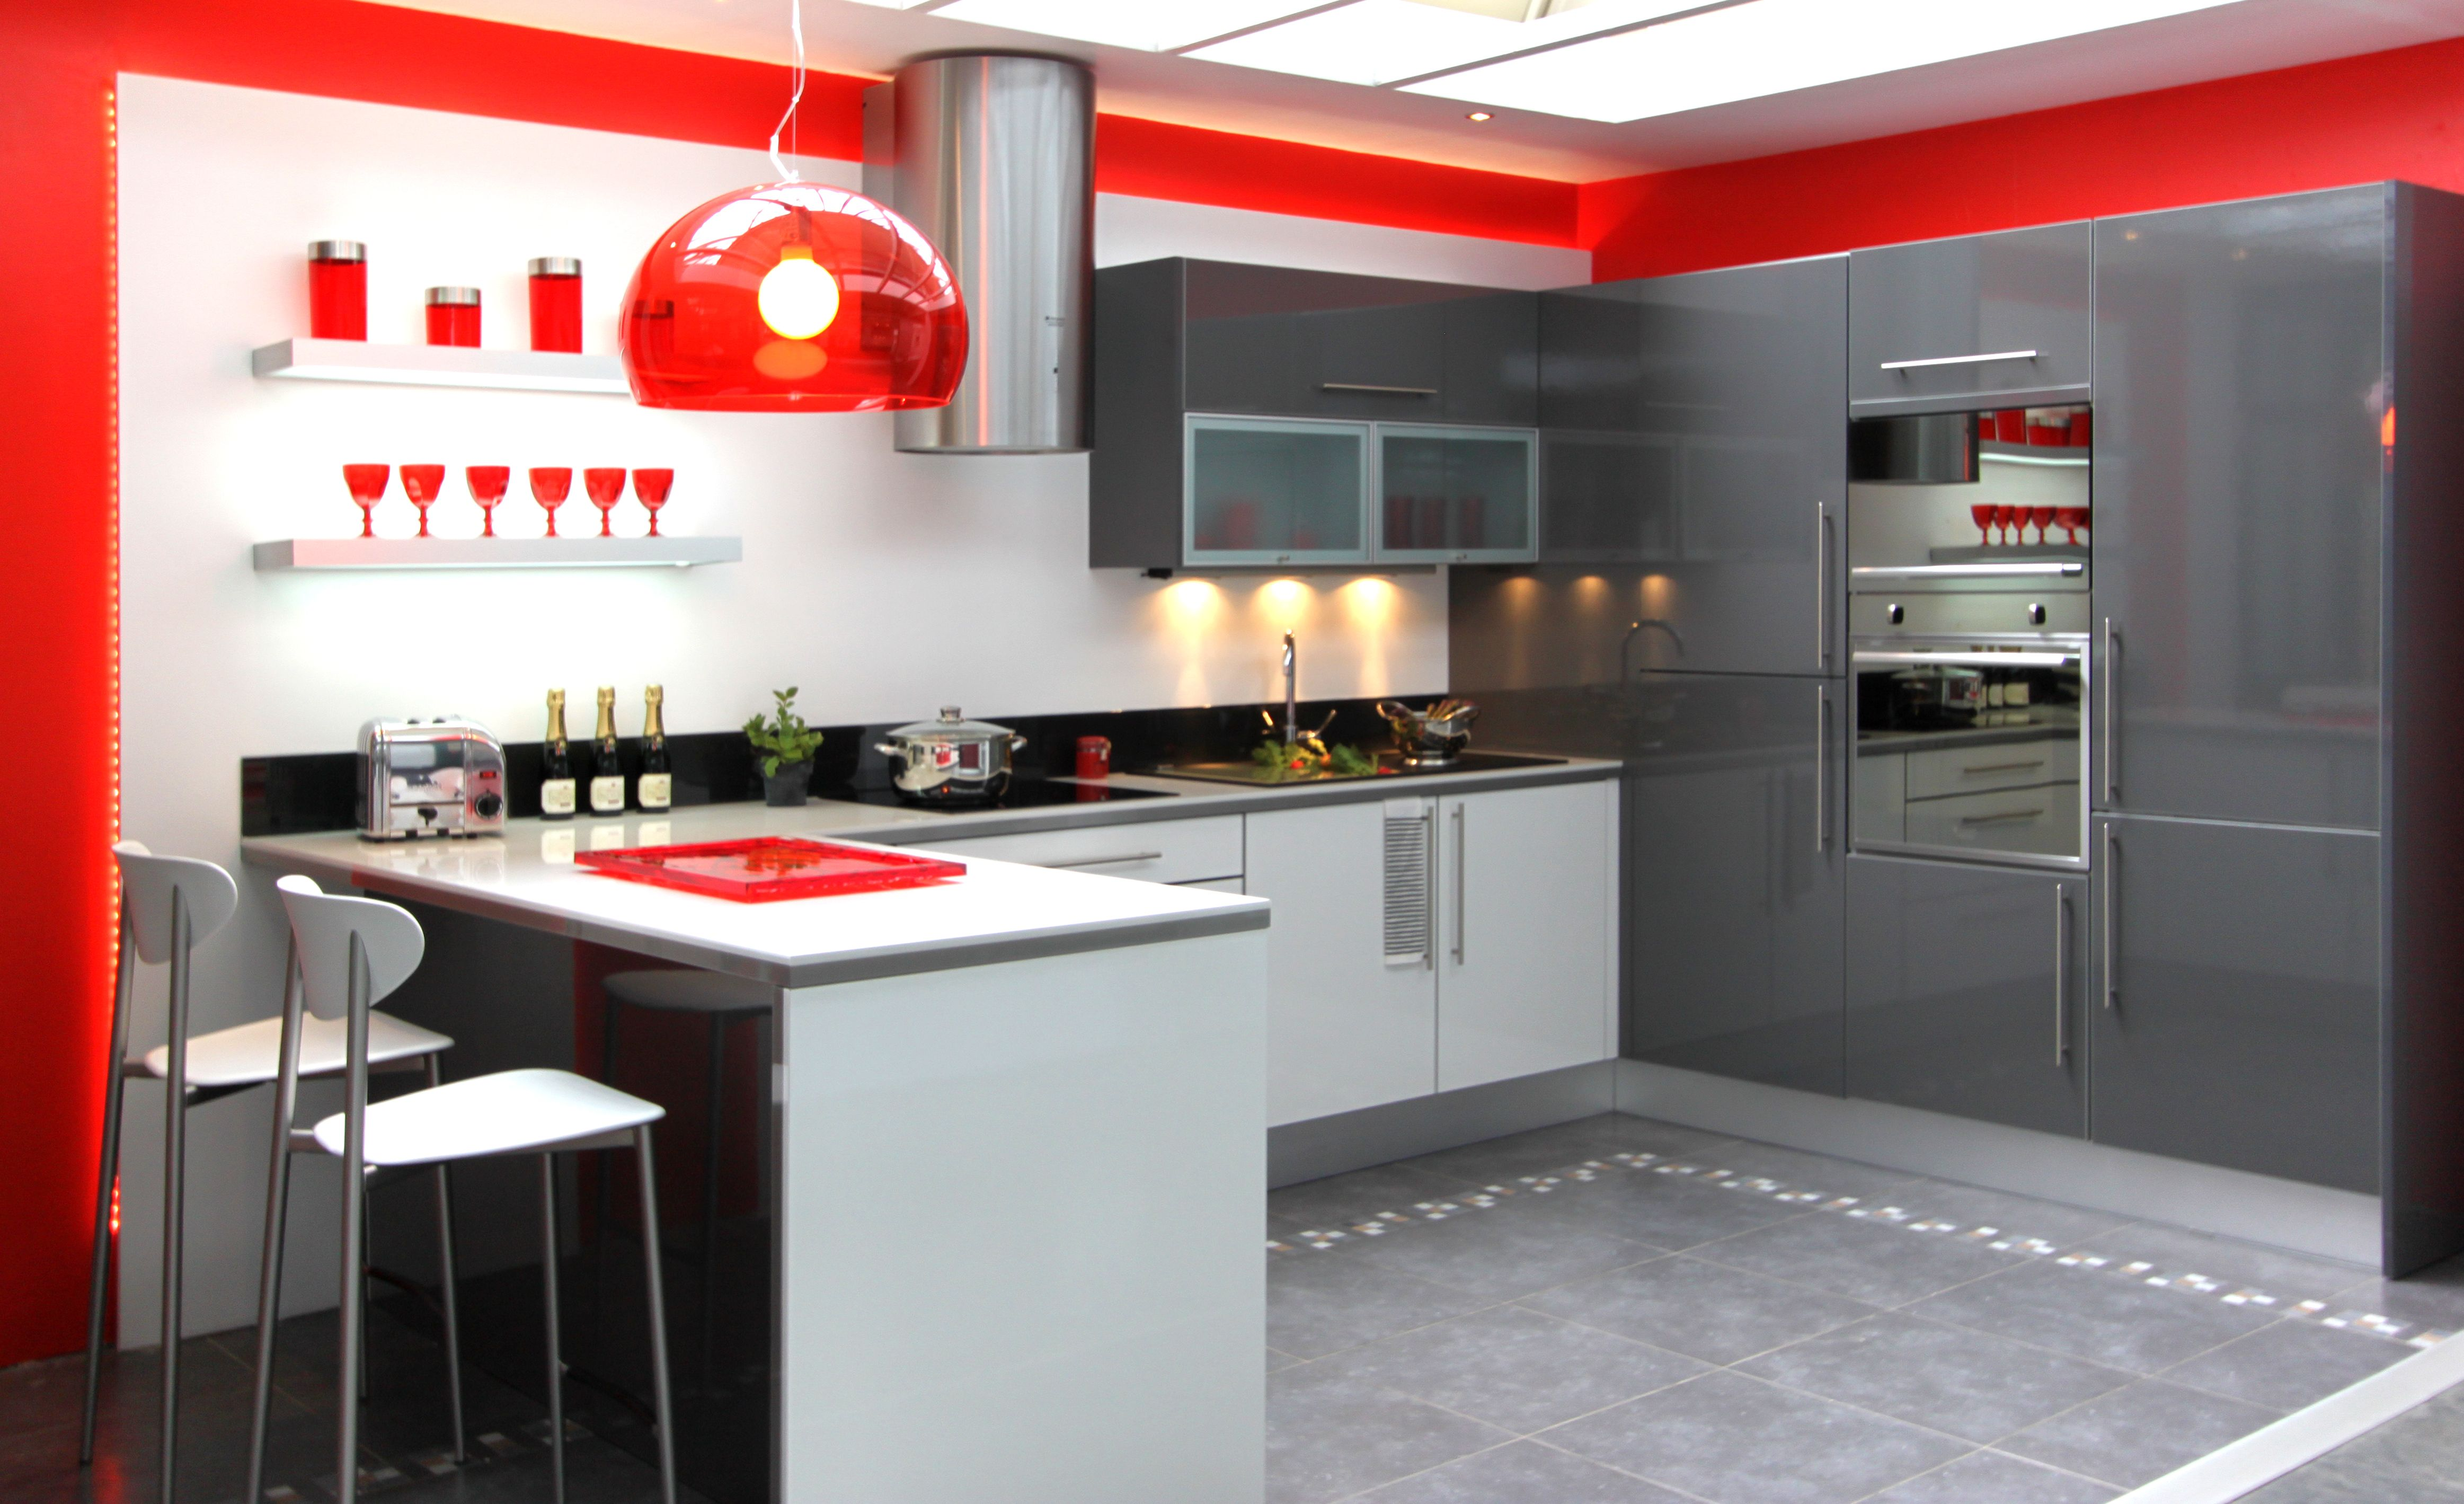 Etagere murale cuisine fly couleur de cuisine grenoble for Cuisine fly